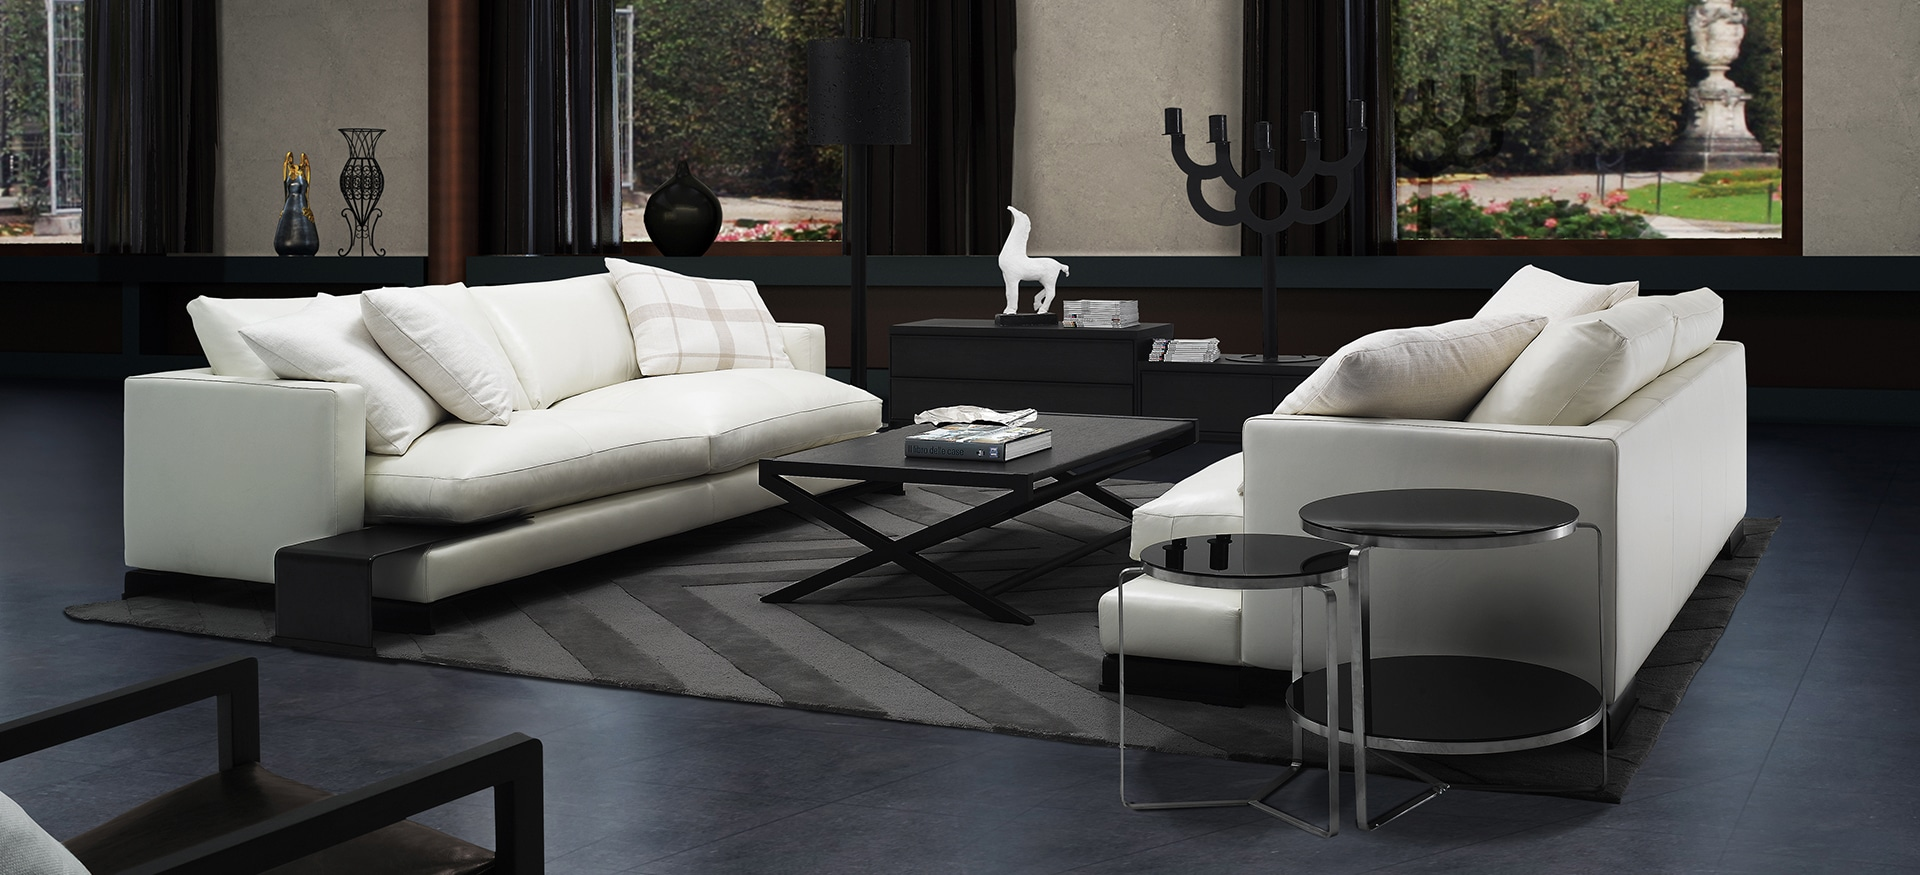 LazyTime Sofa